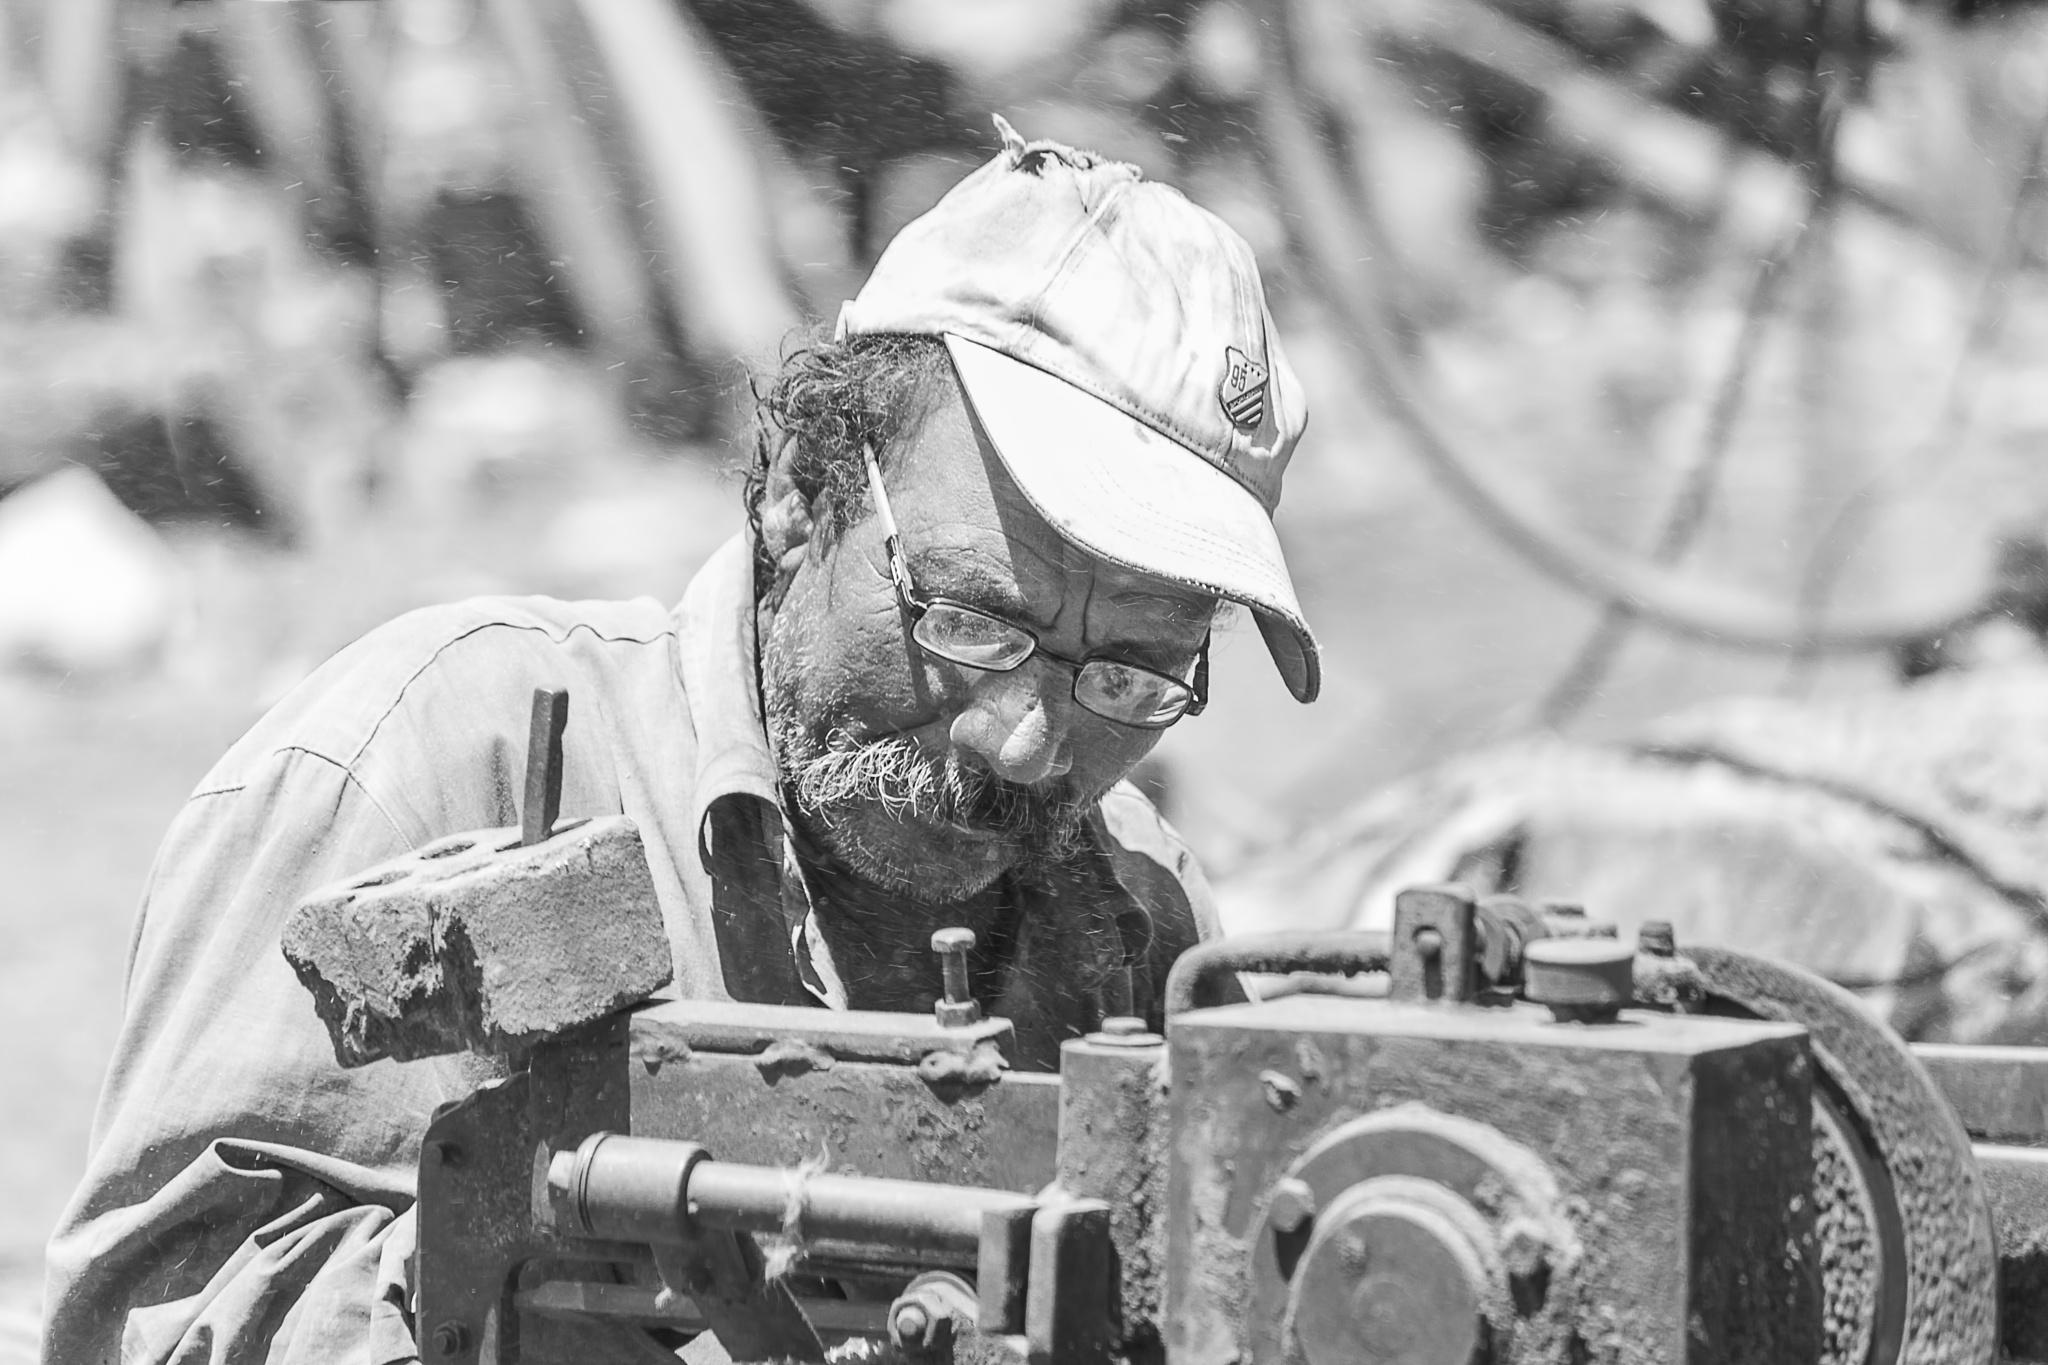 working hard by AymanMuhammad